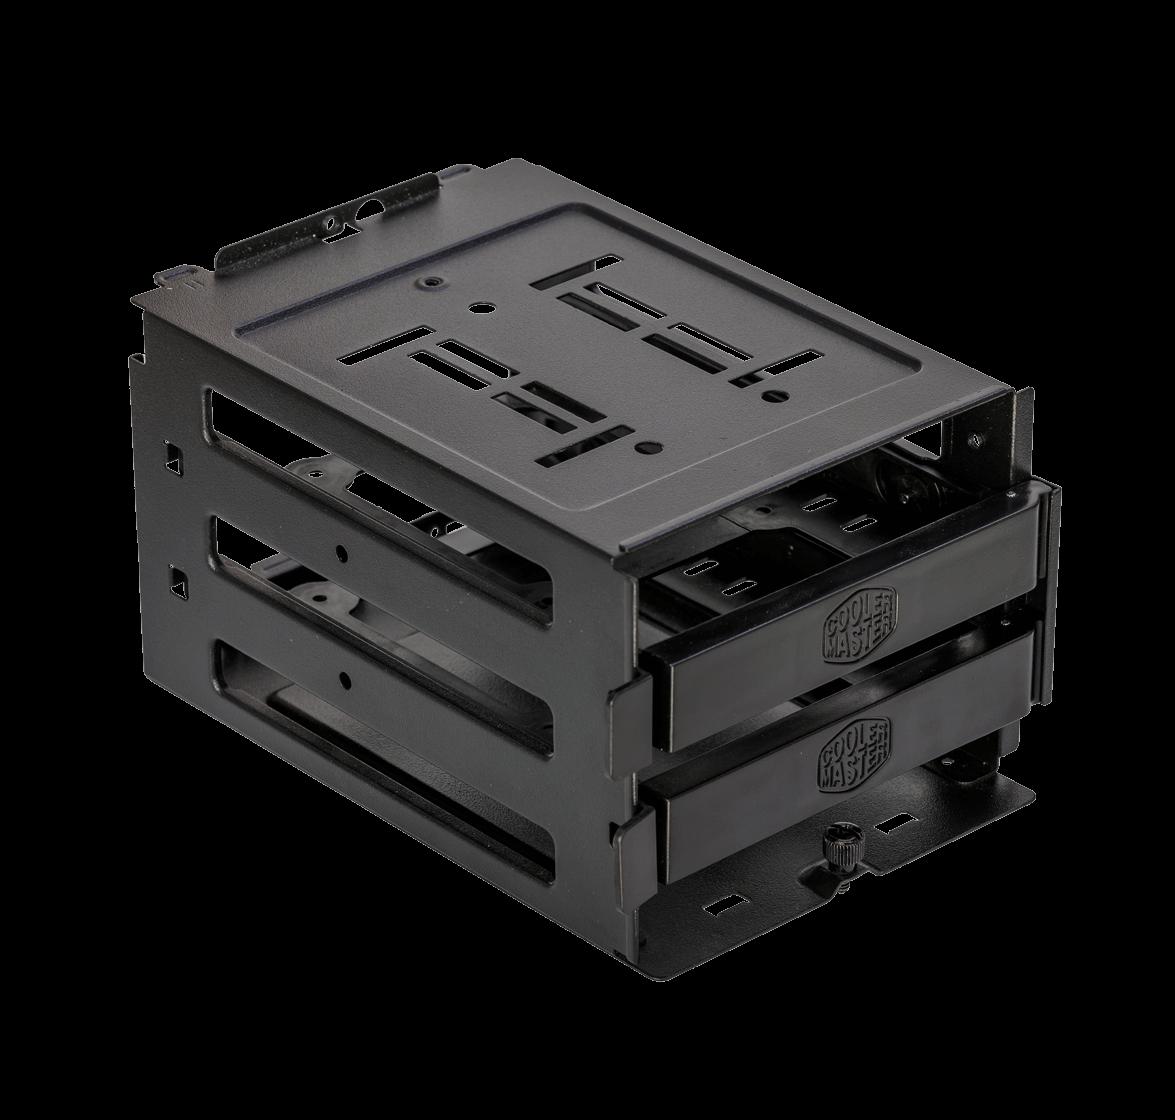 Adaptive Storage Support